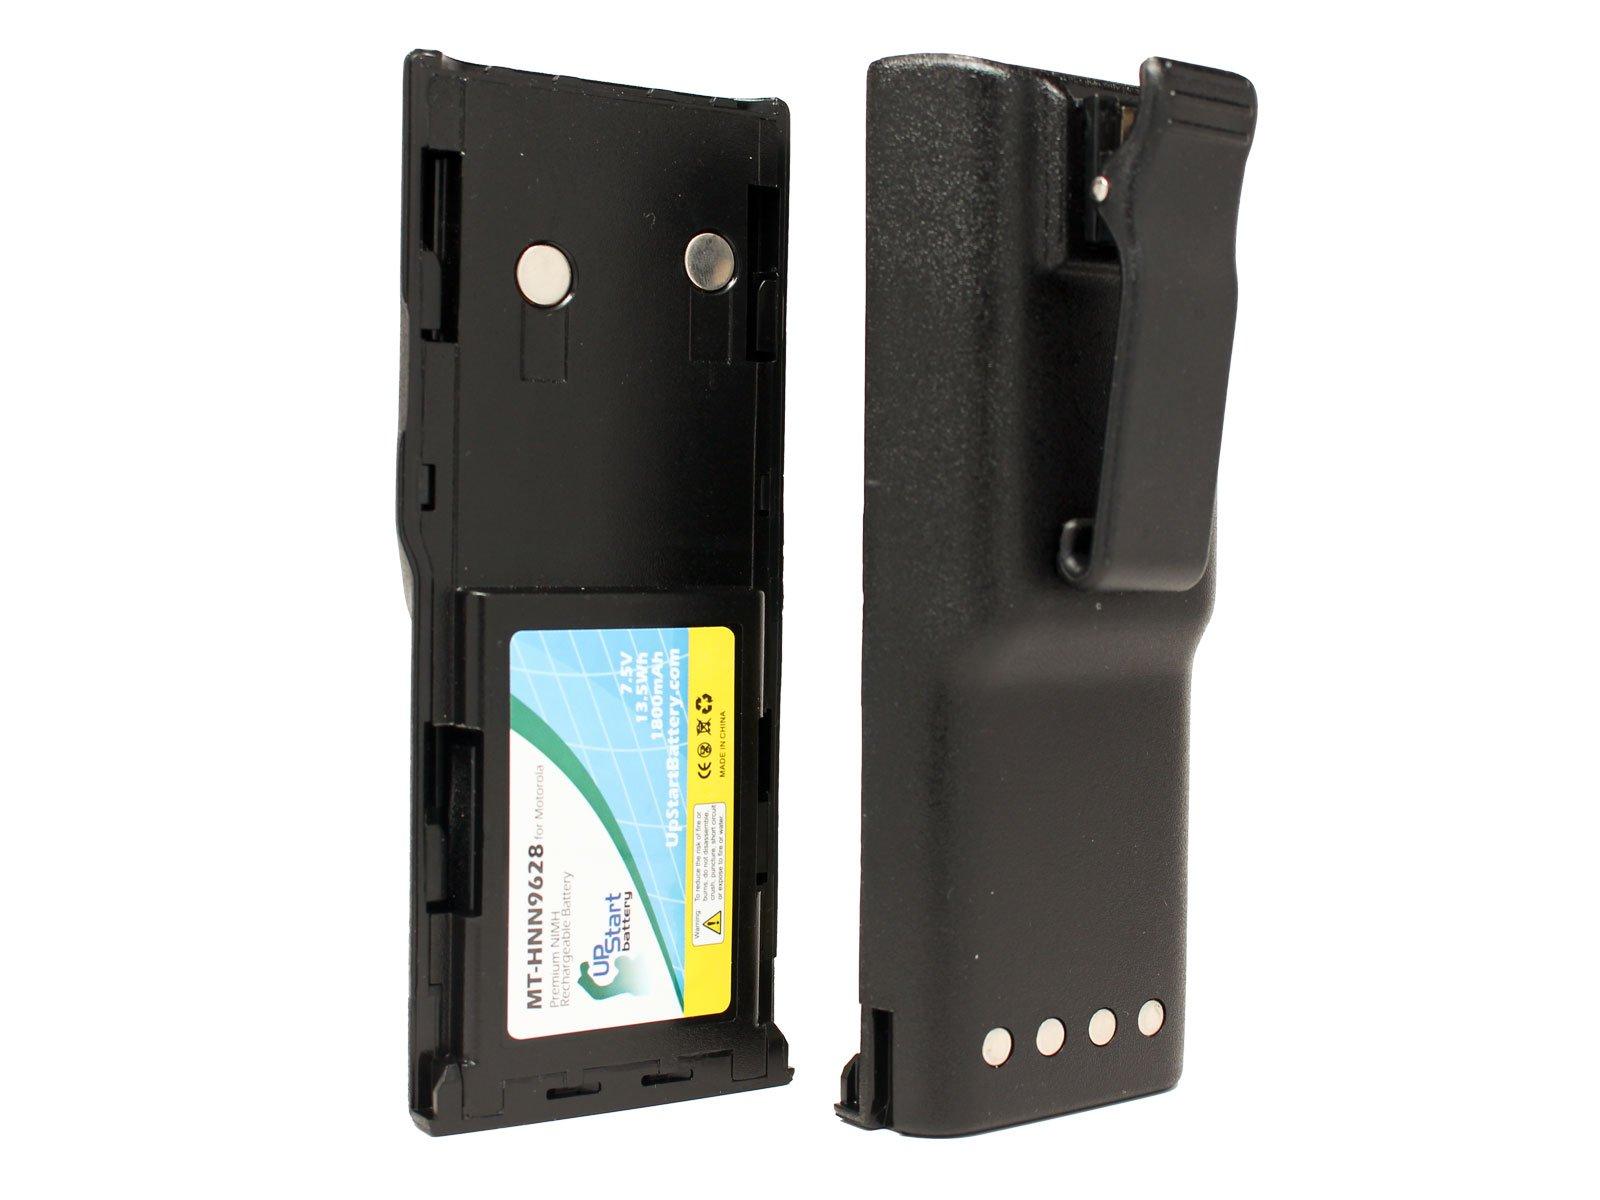 2x Pack - Motorola GP300 Battery - Replacement for Motorola HNN9628 Two-Way Radio Battery (1800mAh, 7.5V, NIMH) - Also Replaces GTX, Radius GP300, GTX800, PTX600, PRO3150, P080, P040, MTX638, LTS2000, LCS2000, GTX900, GP88S, GP88, GP600, GP308, CP250